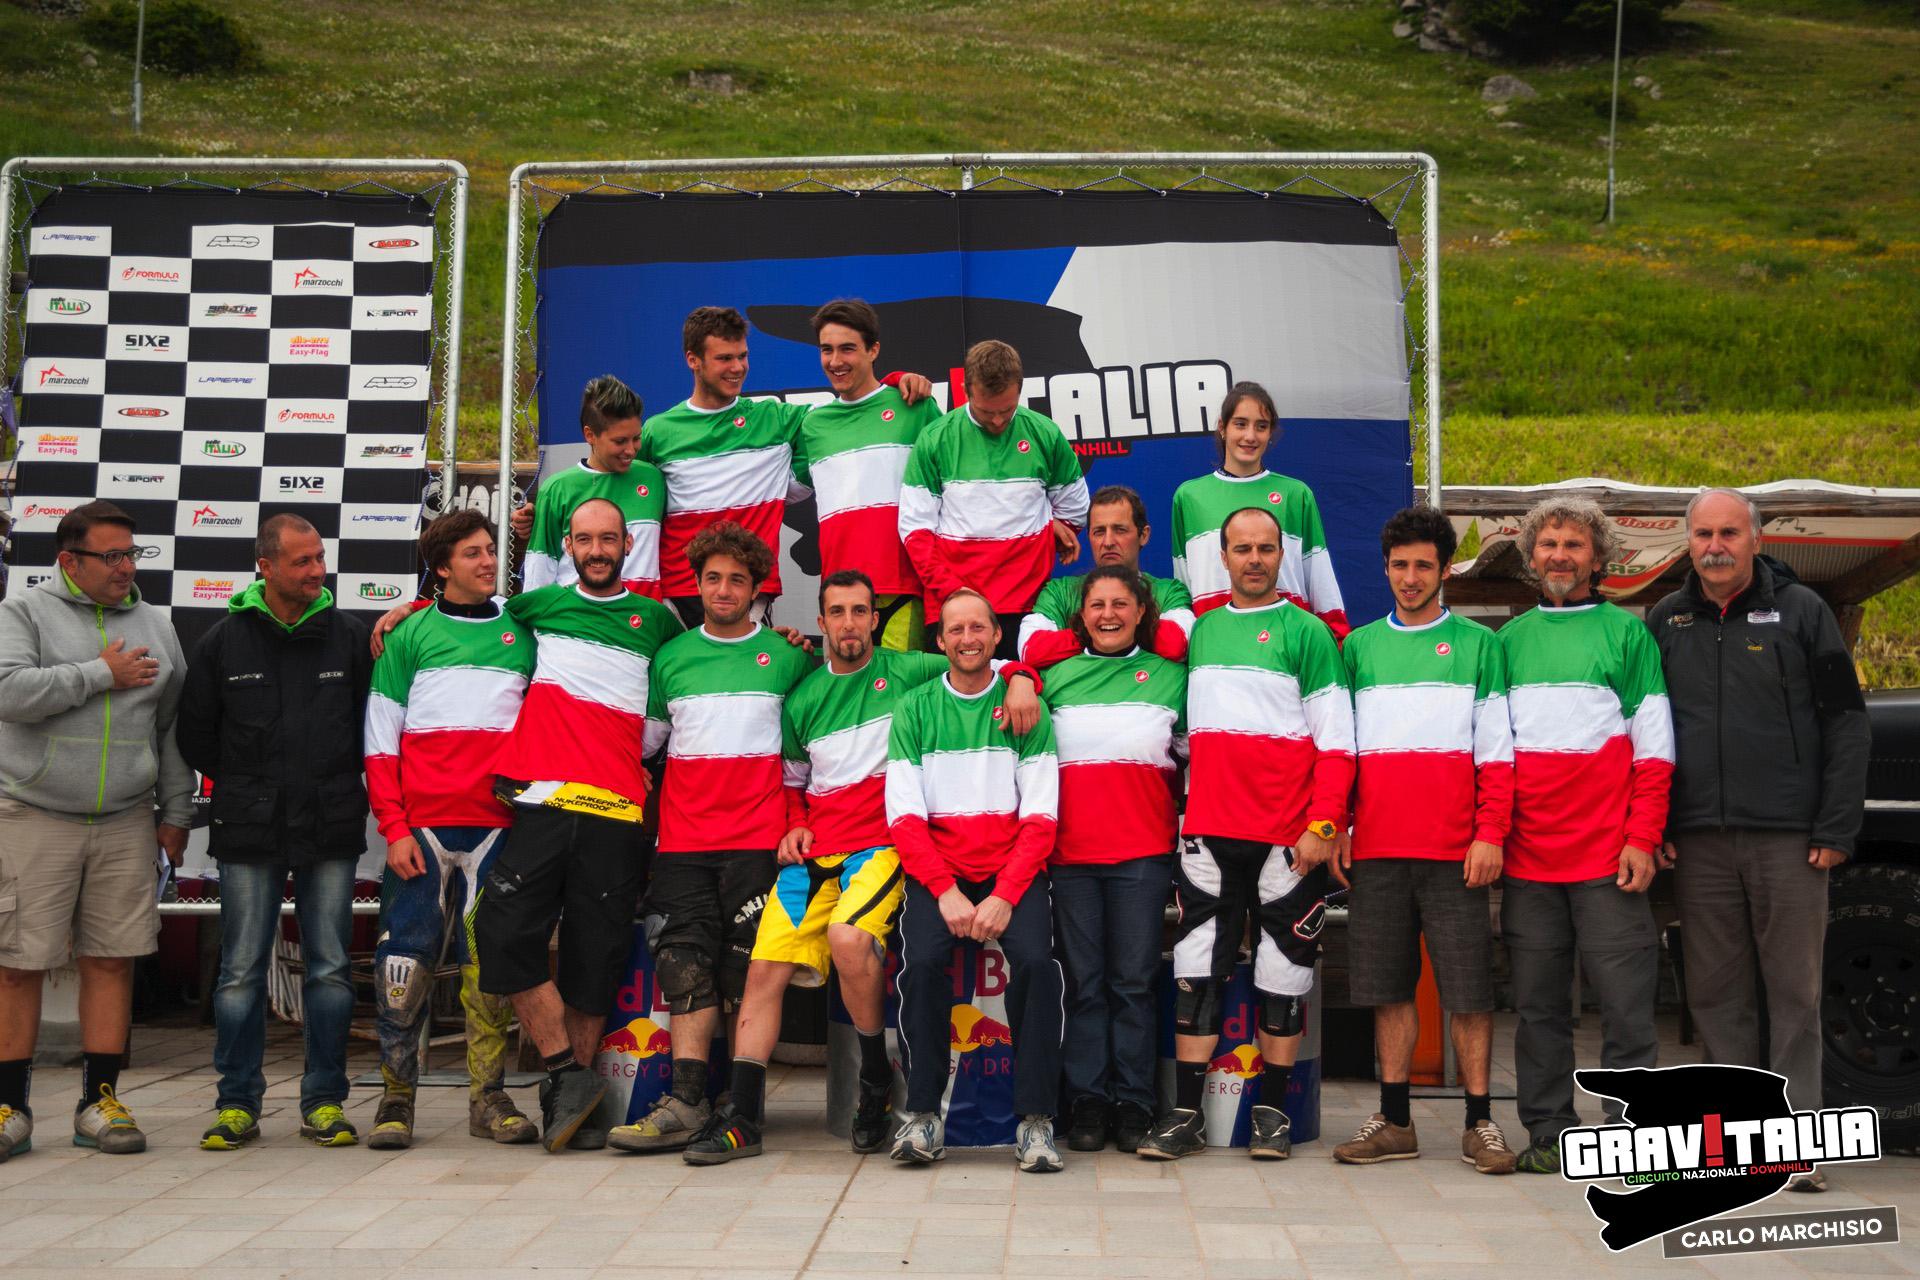 PhotoCarloMarchisio_CampionatiItaliani2014_Champoluc_040 copia